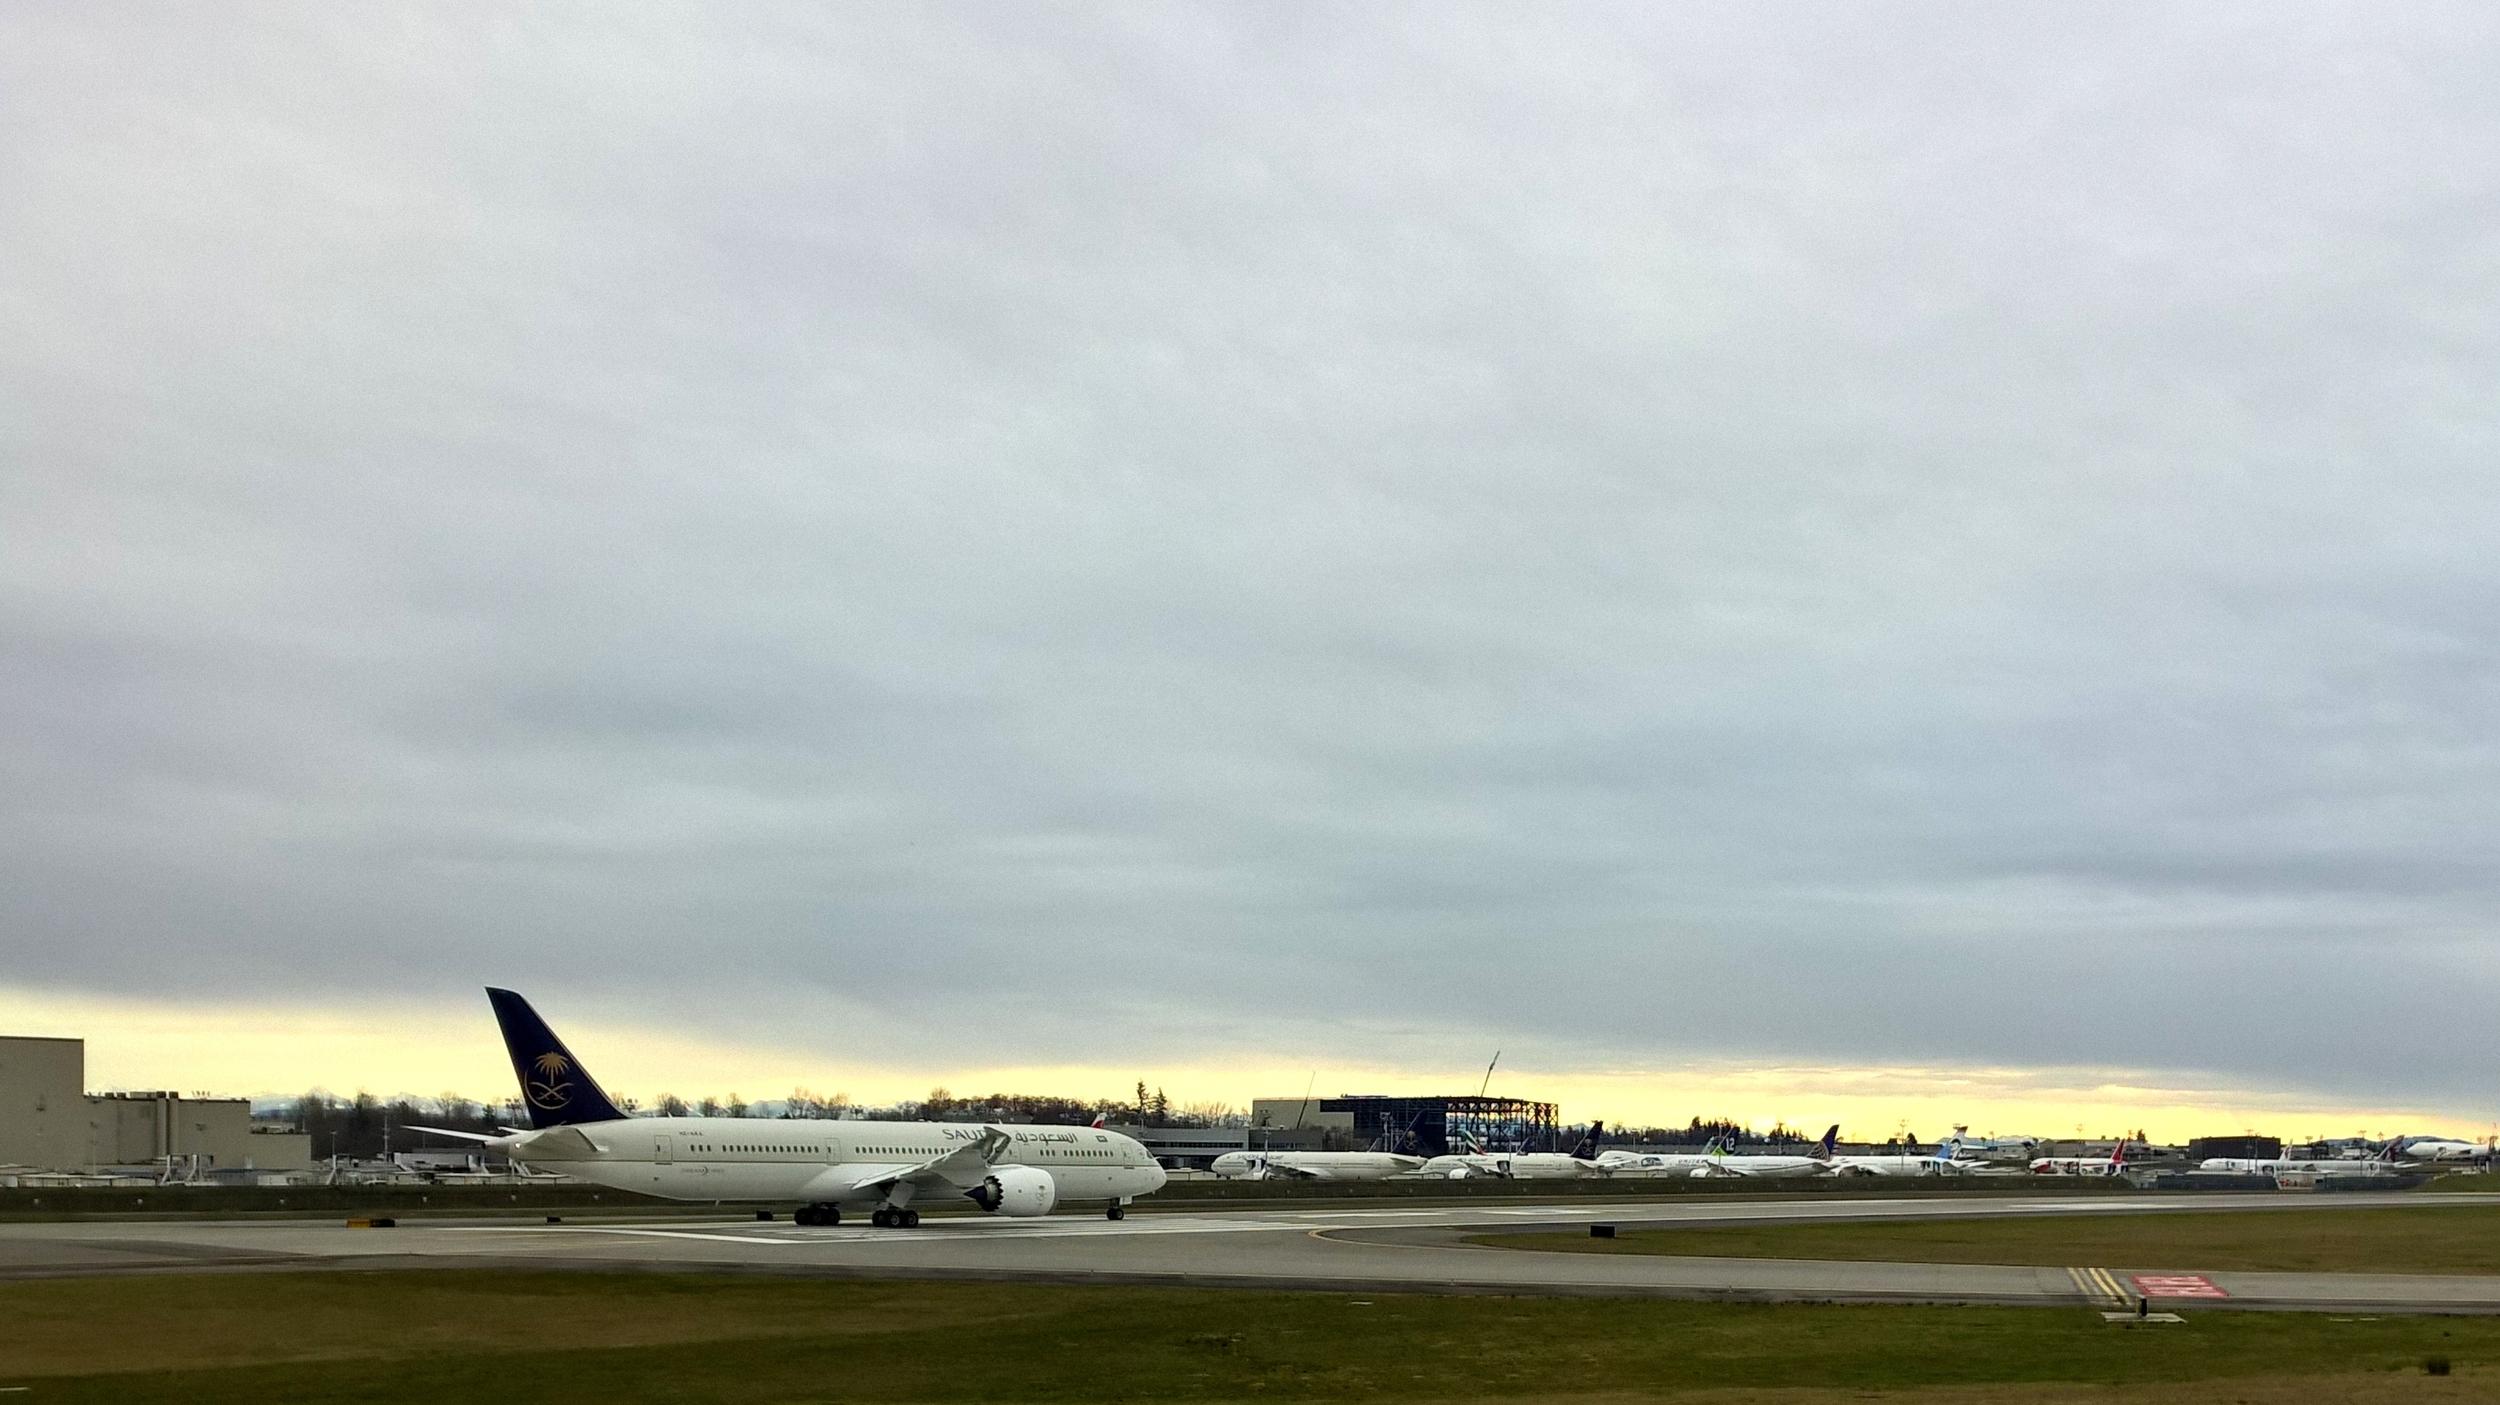 Saudia 787 ready for takeoff